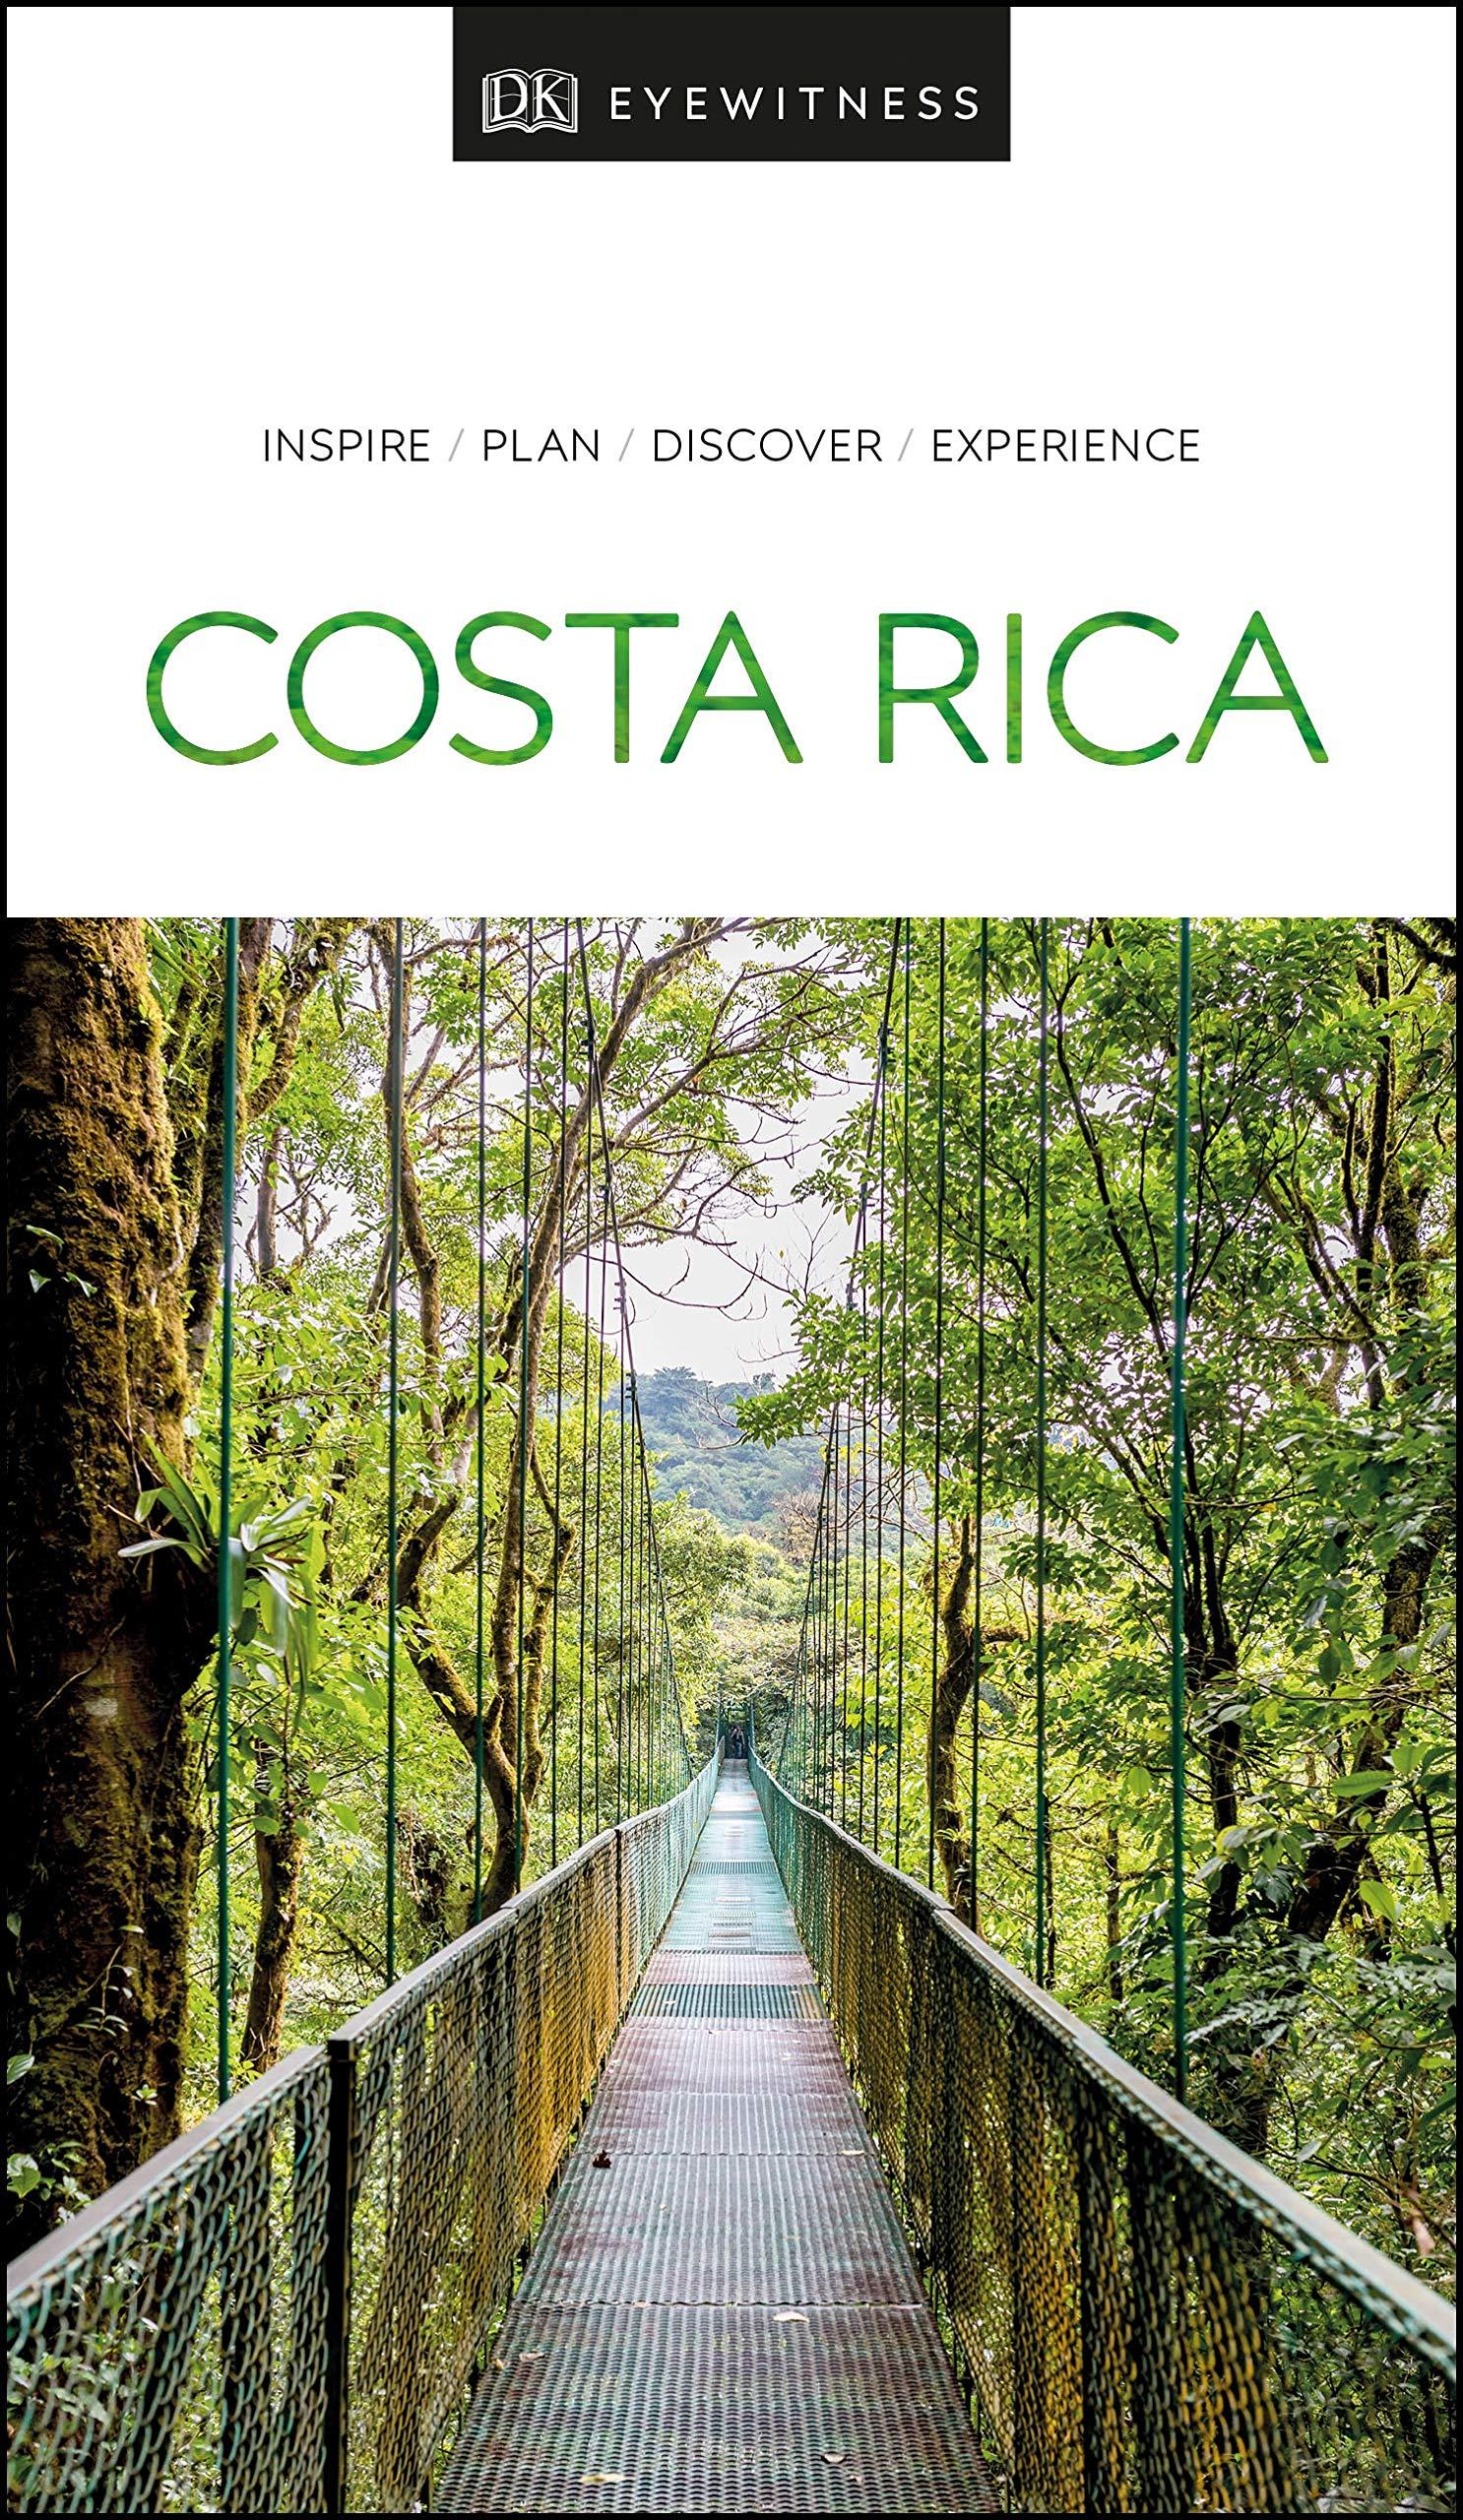 DK Eyewitness Costa Rica: 2019